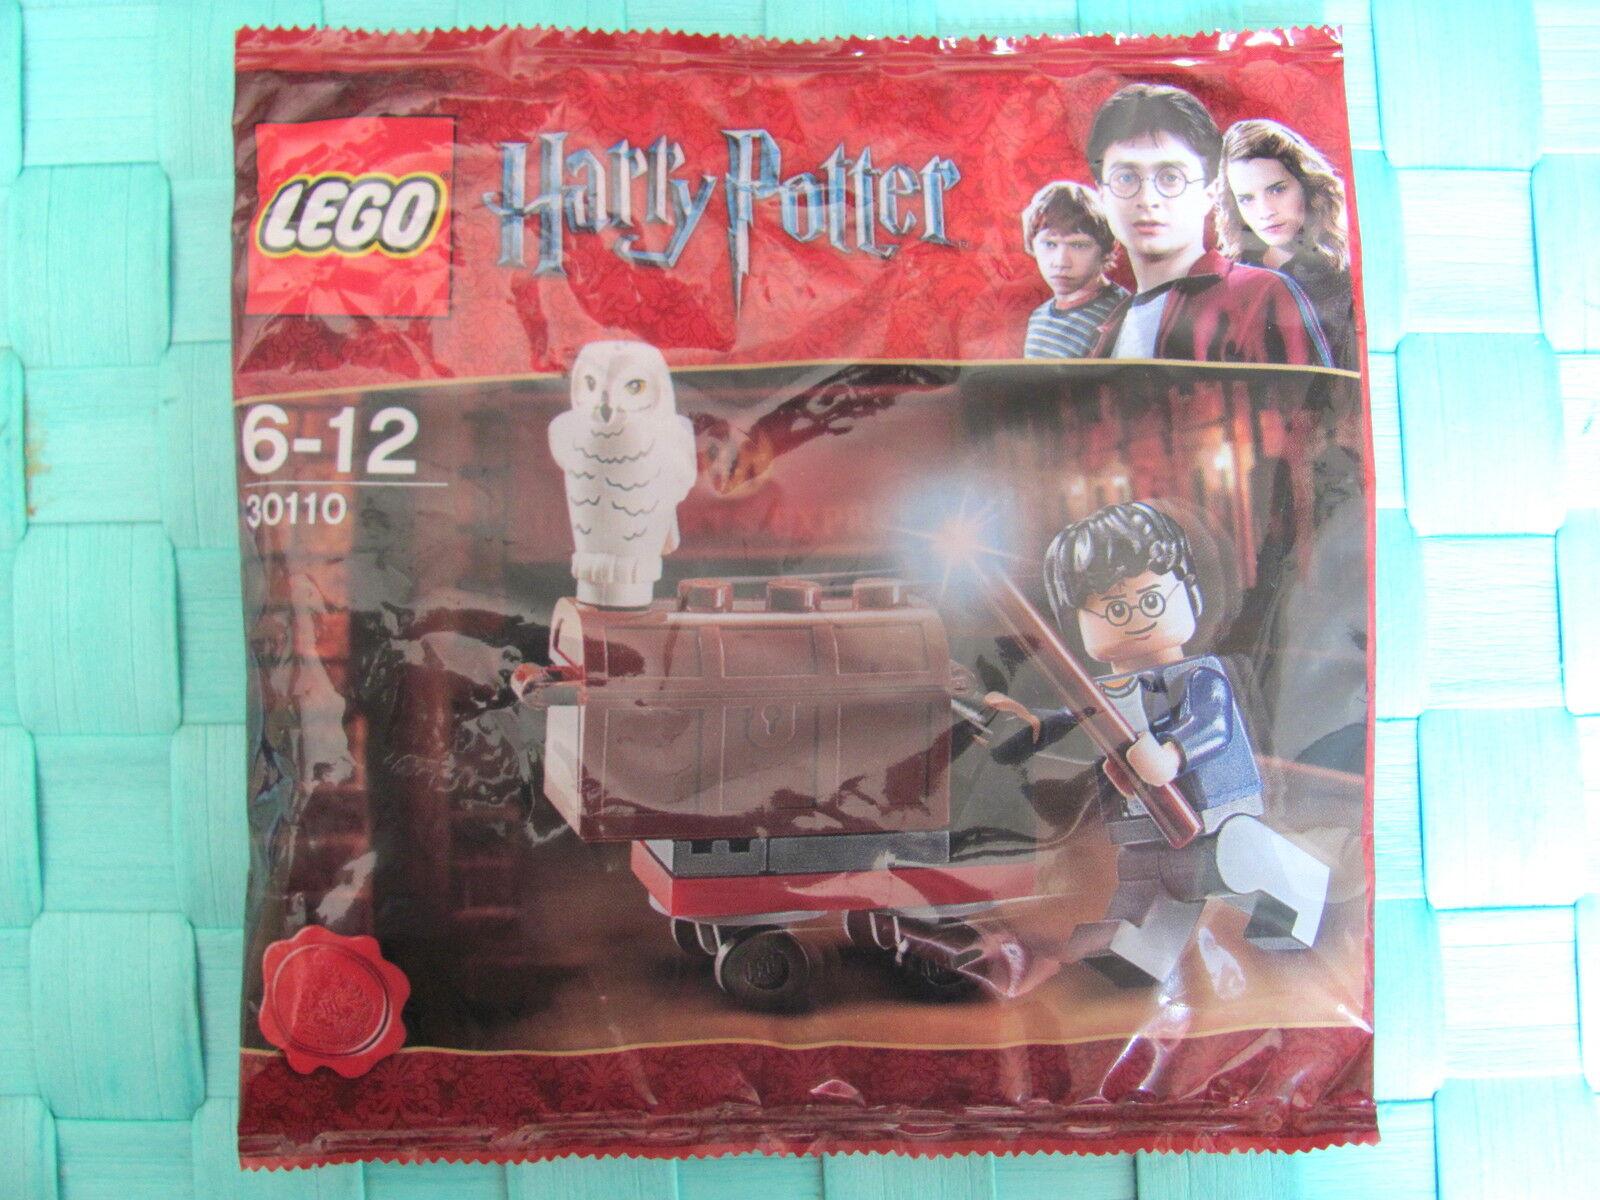 Lego Harry Potter / Hobbit / Fluch der der Fluch Karibik Figuren Promoset Polybag - wählen c6236a